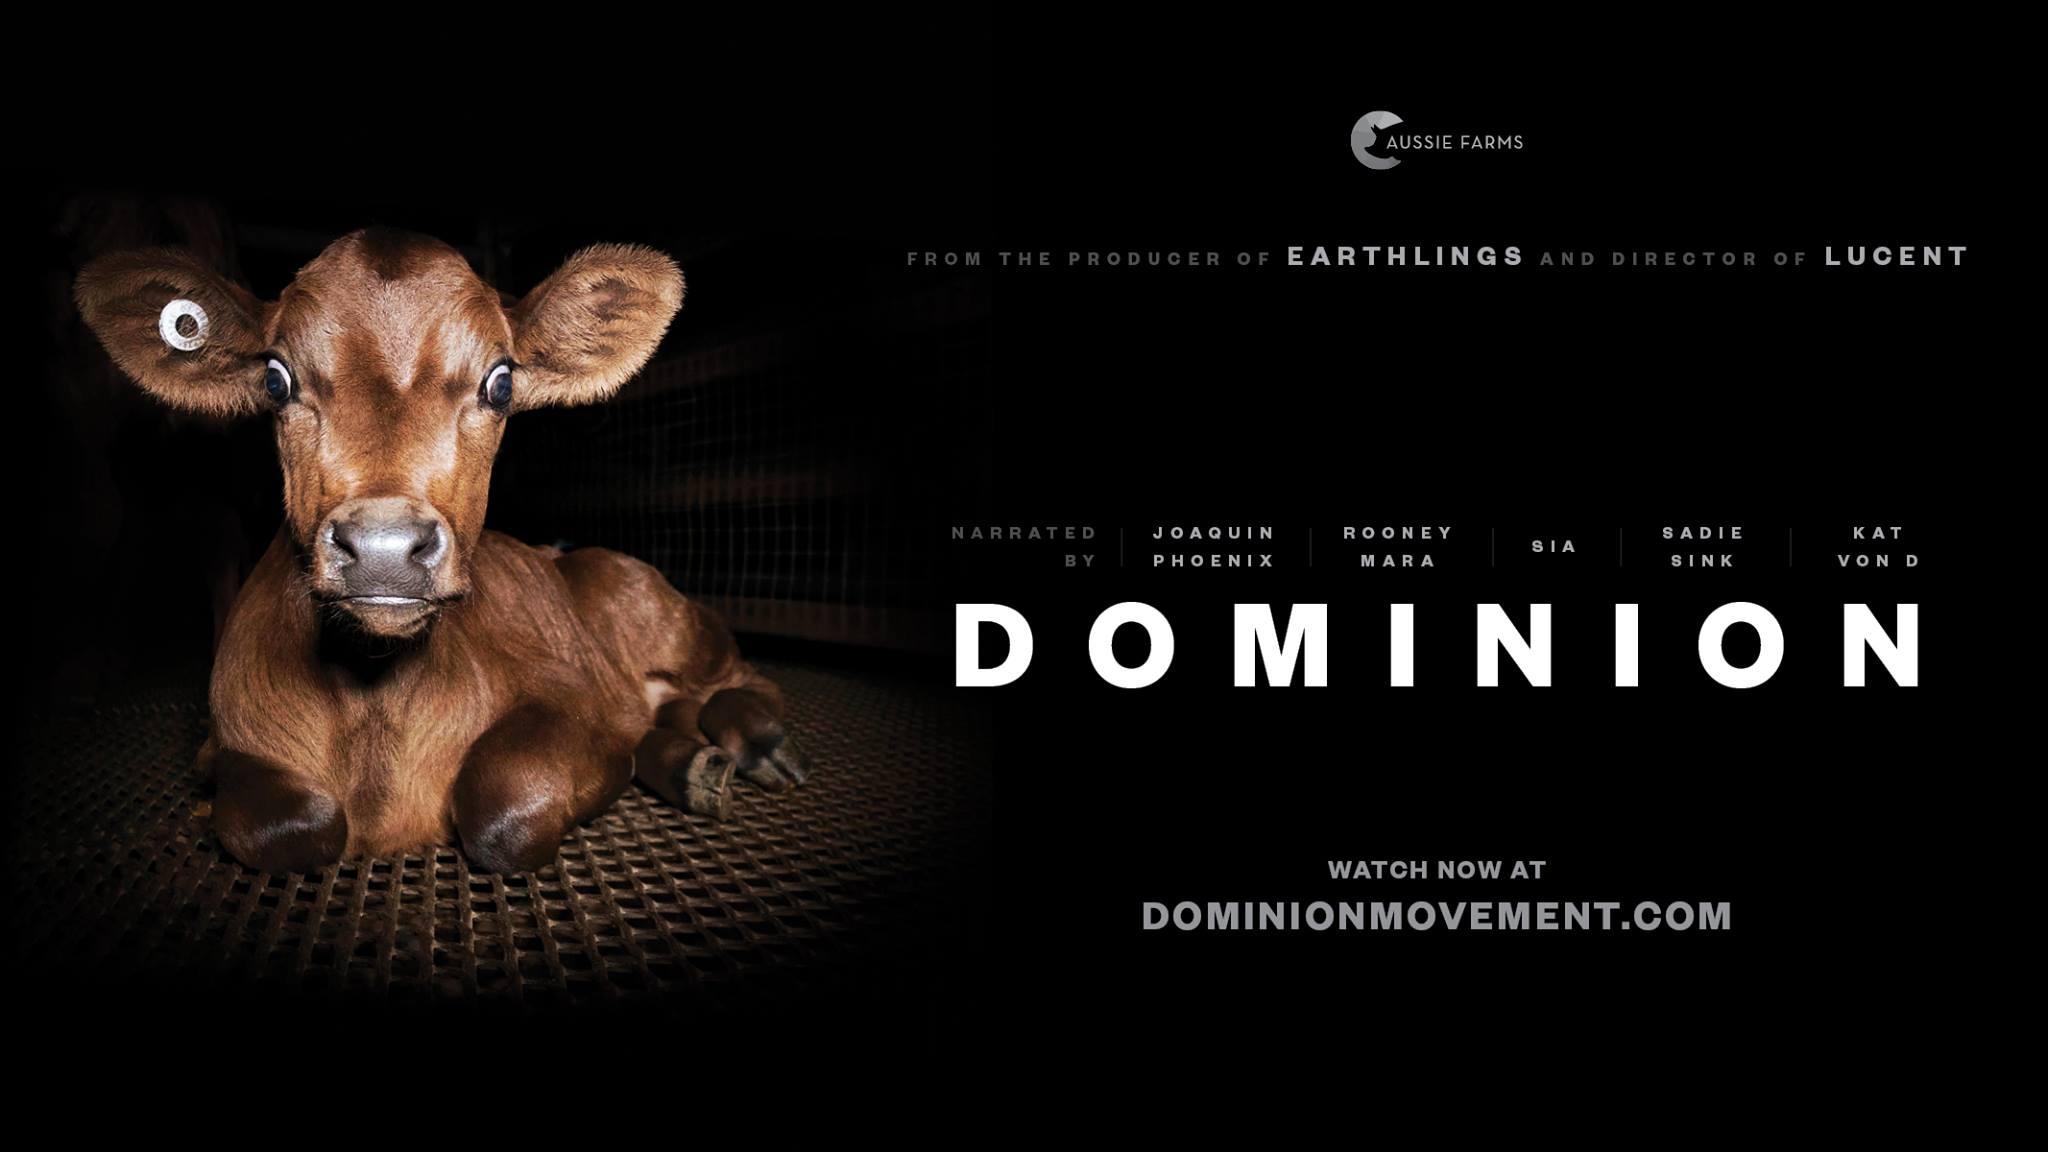 Dominion, the documentary